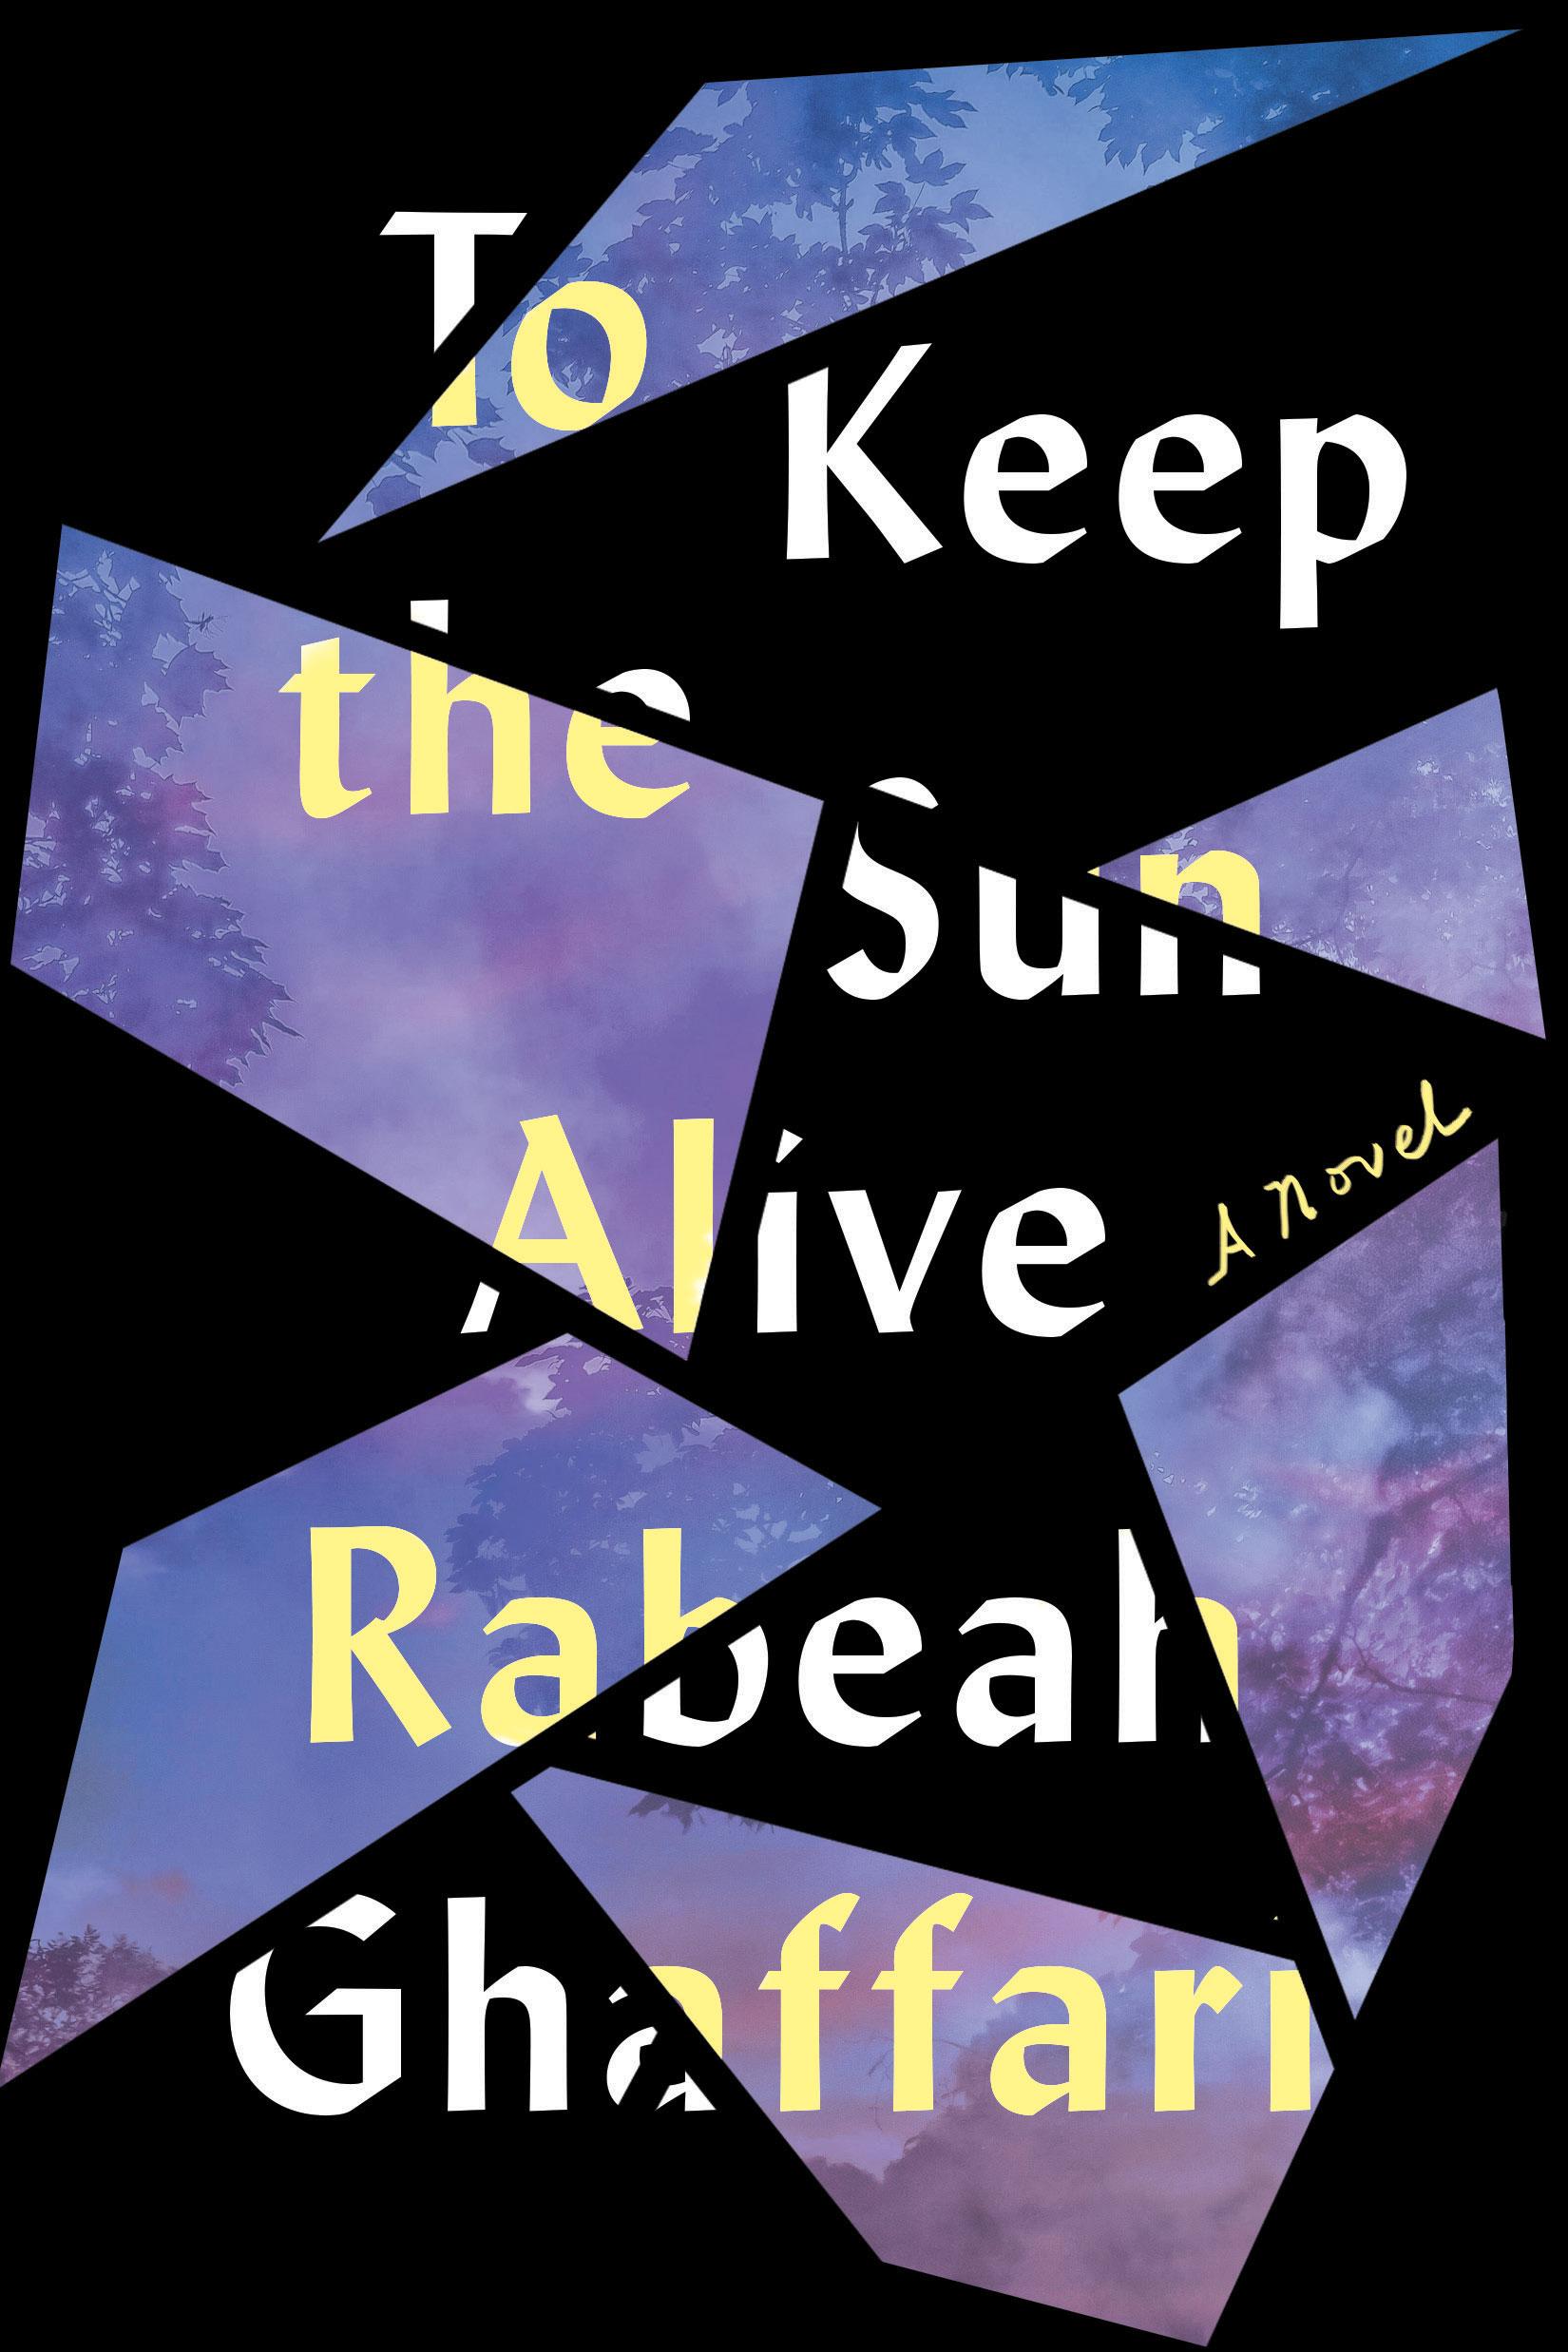 To-Keep-the-Sun-Alive_cvrs-4.jpg